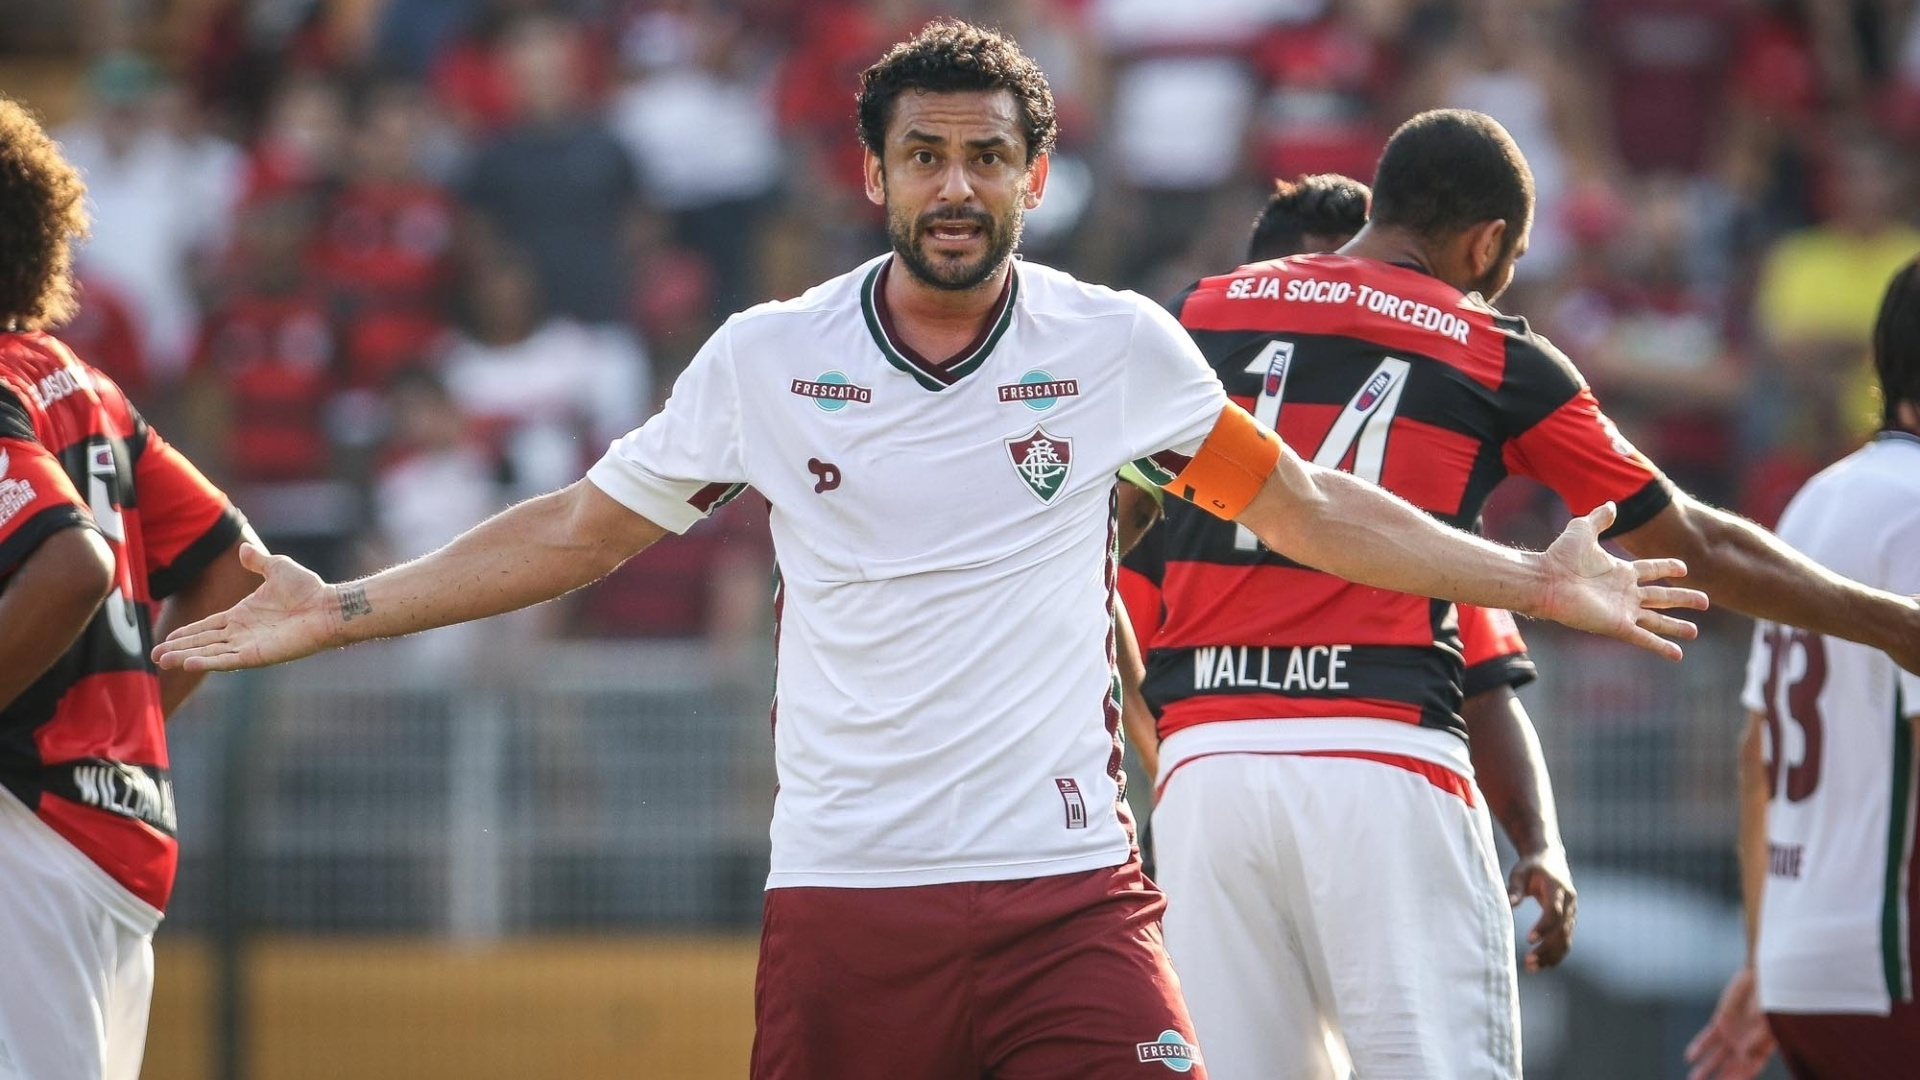 Fred gesticula durante a partida entre Flamengo e Fluminense